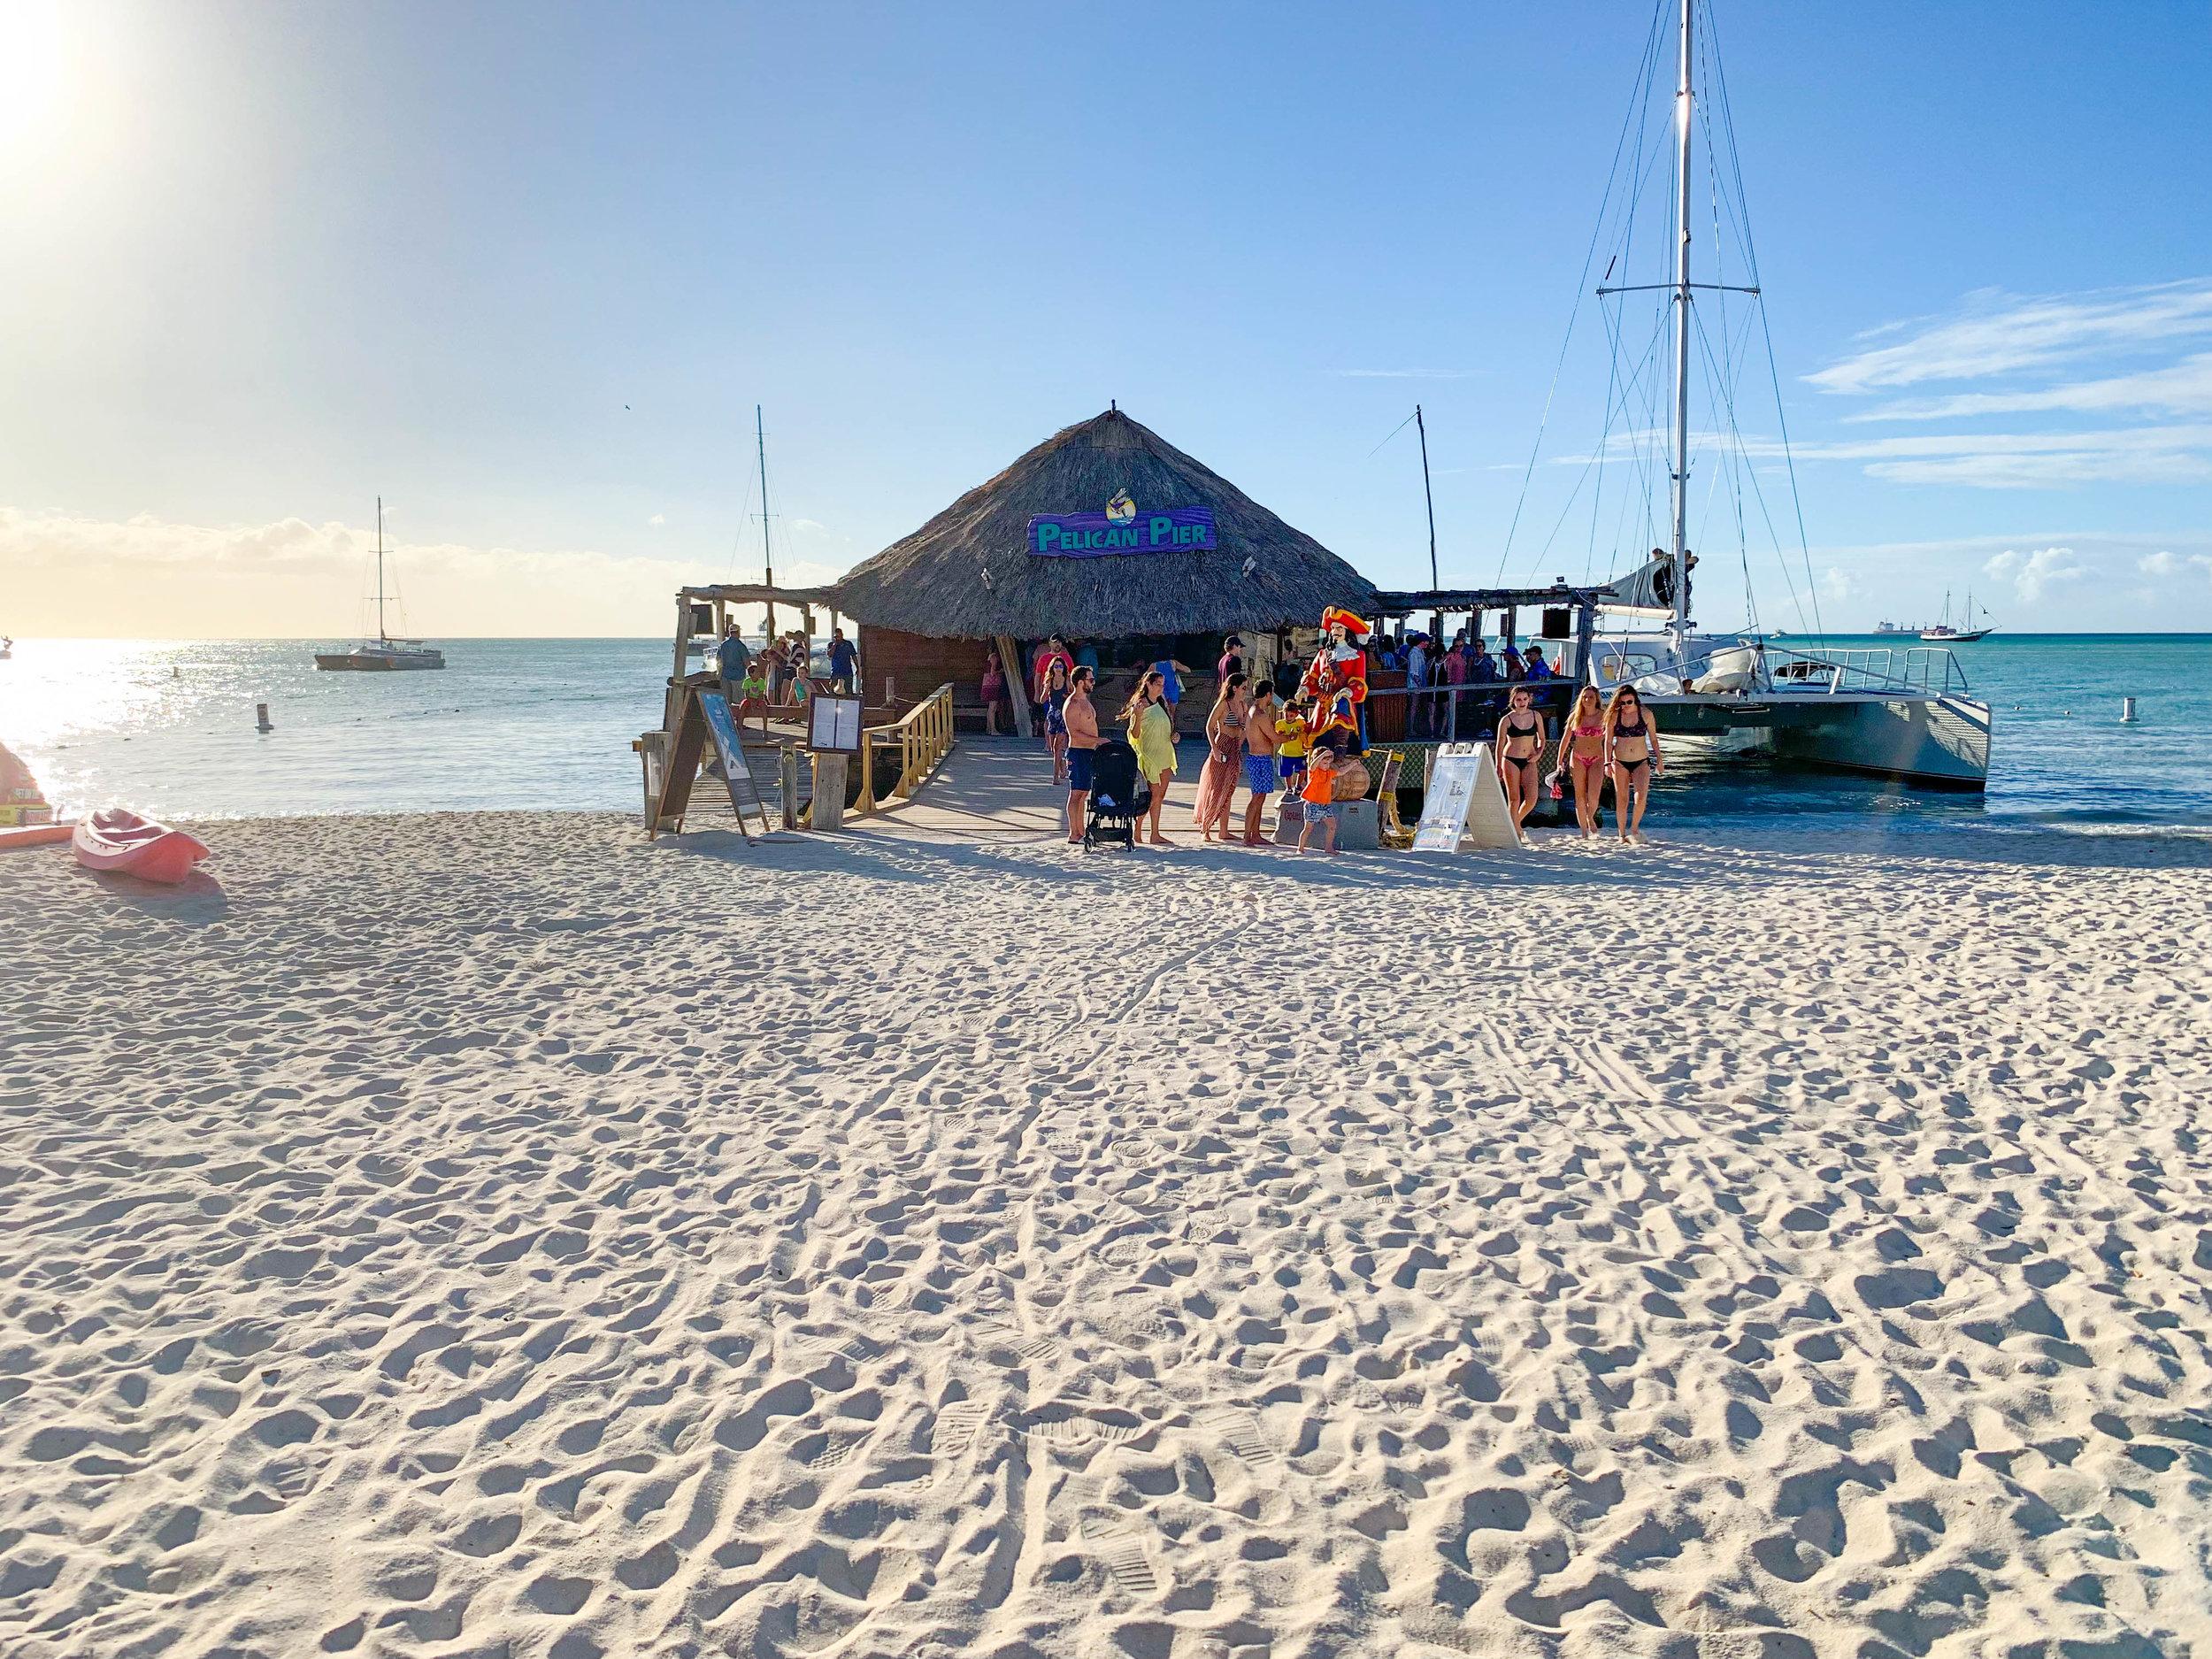 Pelican Pier in Aruba